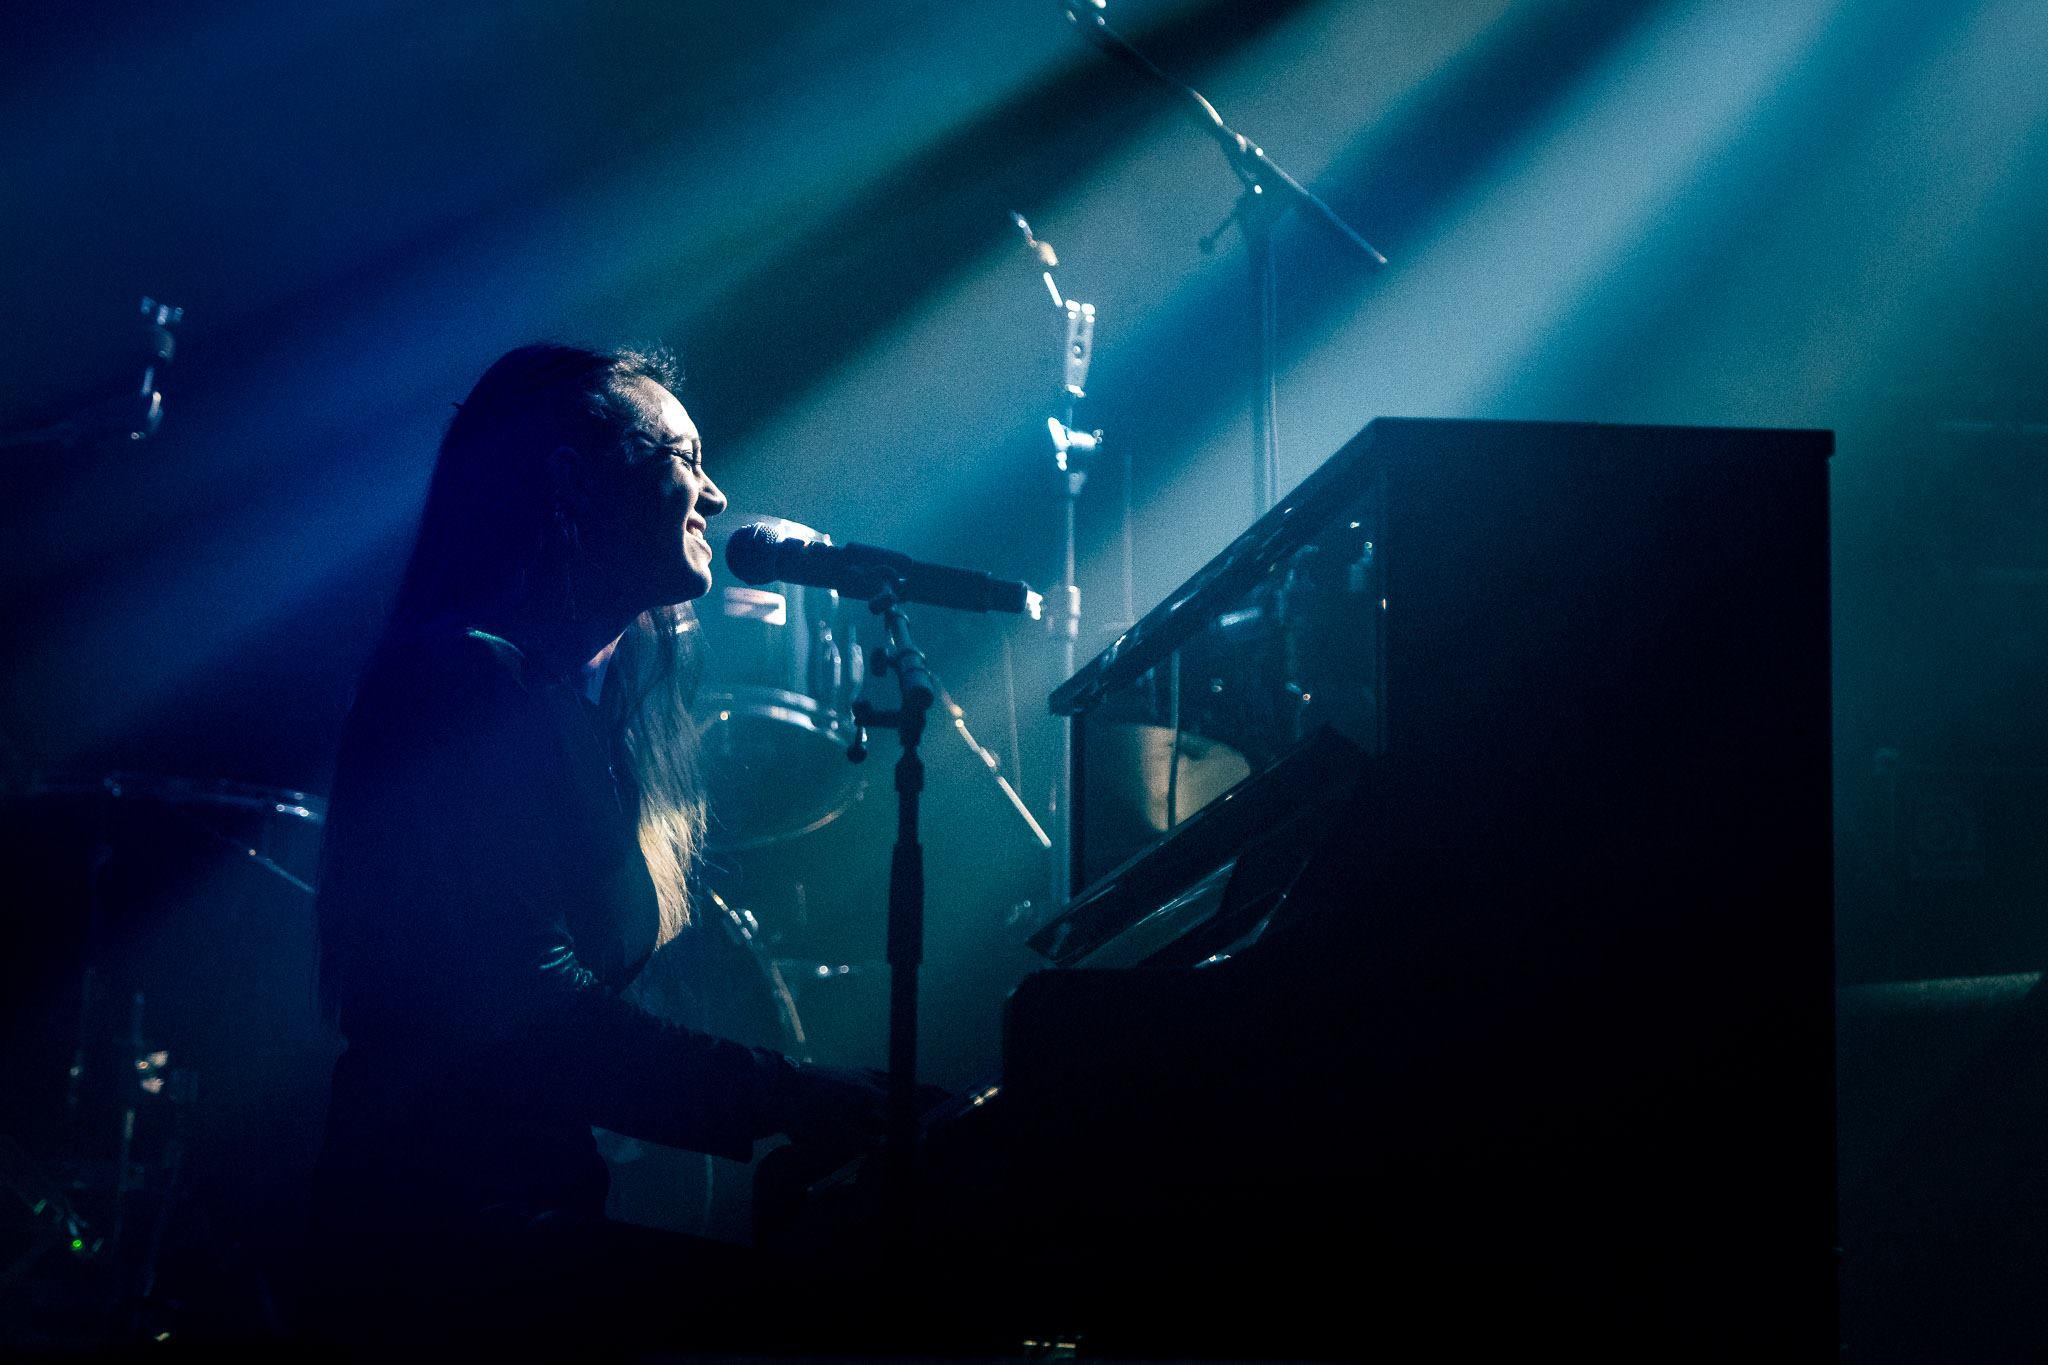 Sofia-Dragt-piano-Art-Rocks-Finale-Paradiso-photo-by-Jelmer-de-Haas.jpg